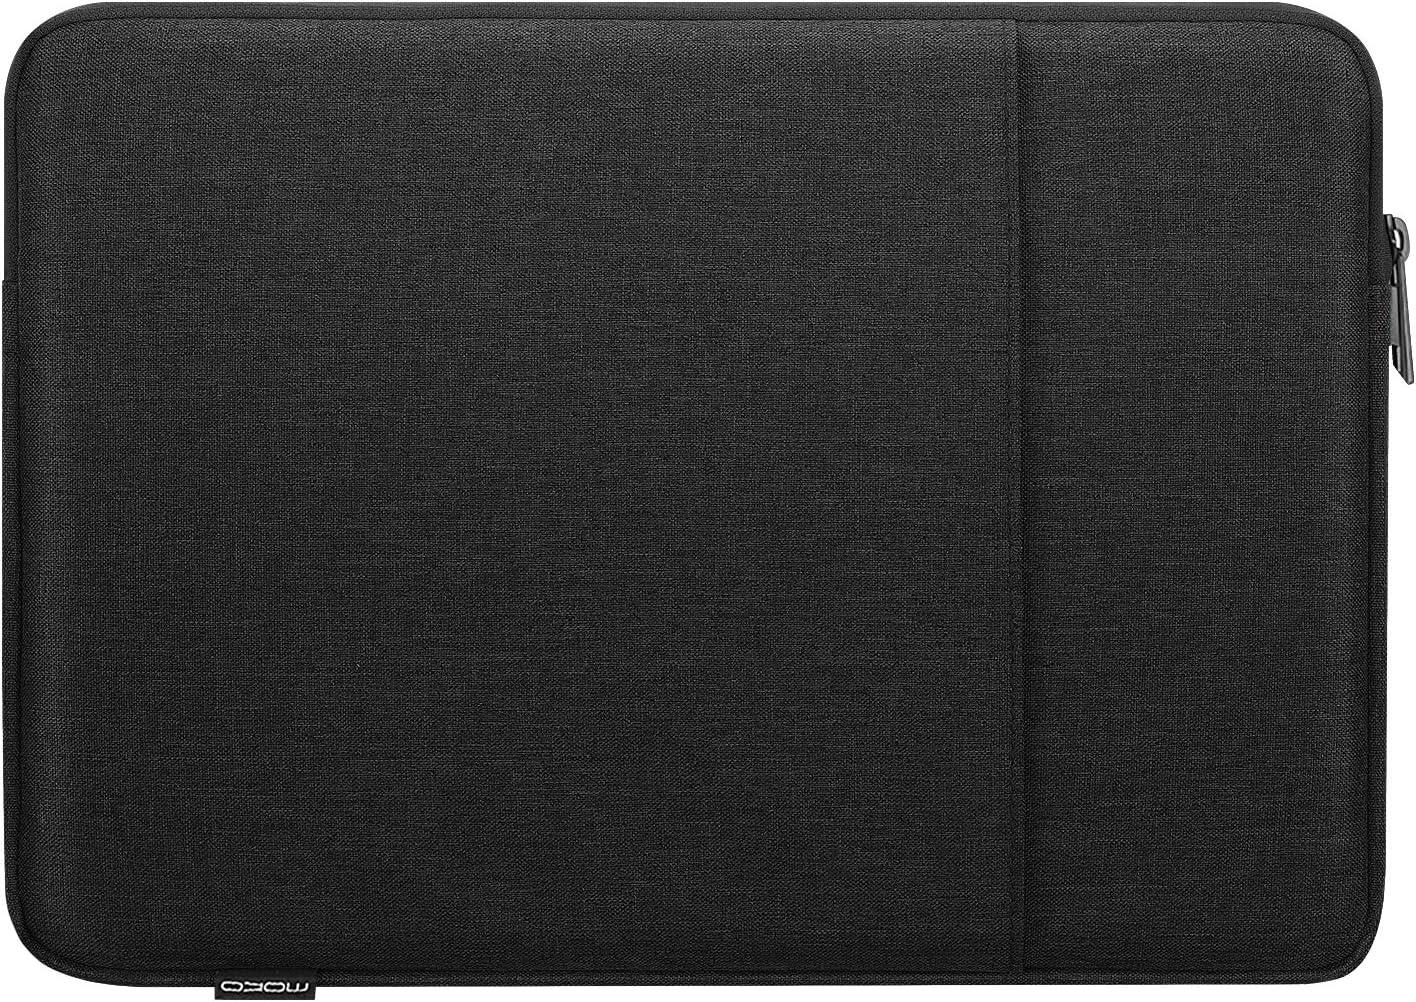 Tab S6 Lite iPad 8th 7th Generation 10.2 Fit Smart Keyboard iPad Air 4 10.9 MoKo 11 Inch Tablet Sleeve Bag Carrying Case Fits iPad Pro 11 iPad Air 3 10.5 Galaxy Tab A 10.1 S7 iPad 9.7